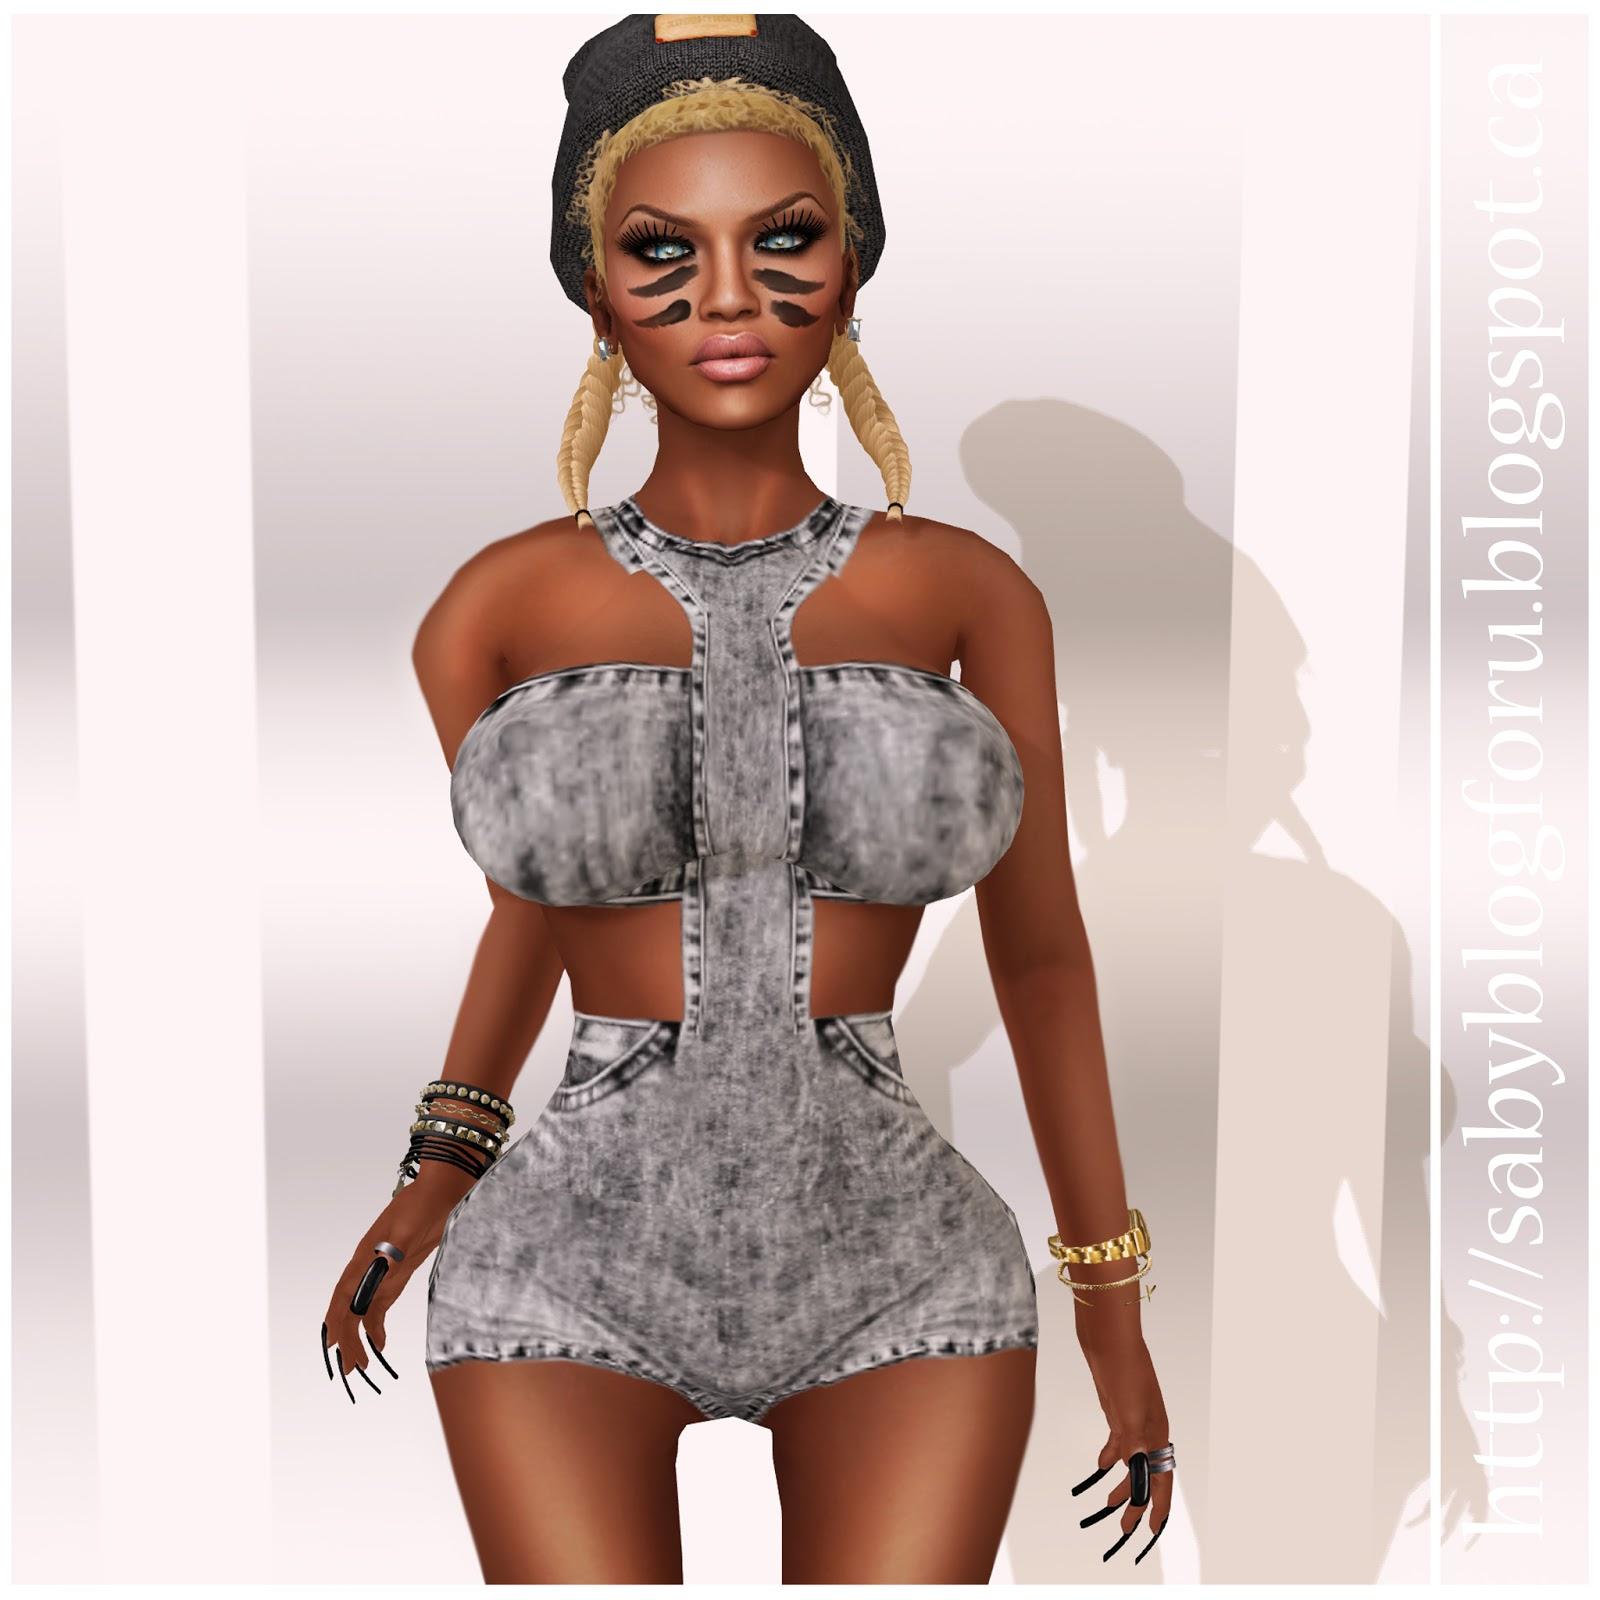 7cfe4cb5d937a Skin  Sandra from  Meghindo s  (Creator  meghindo romano)